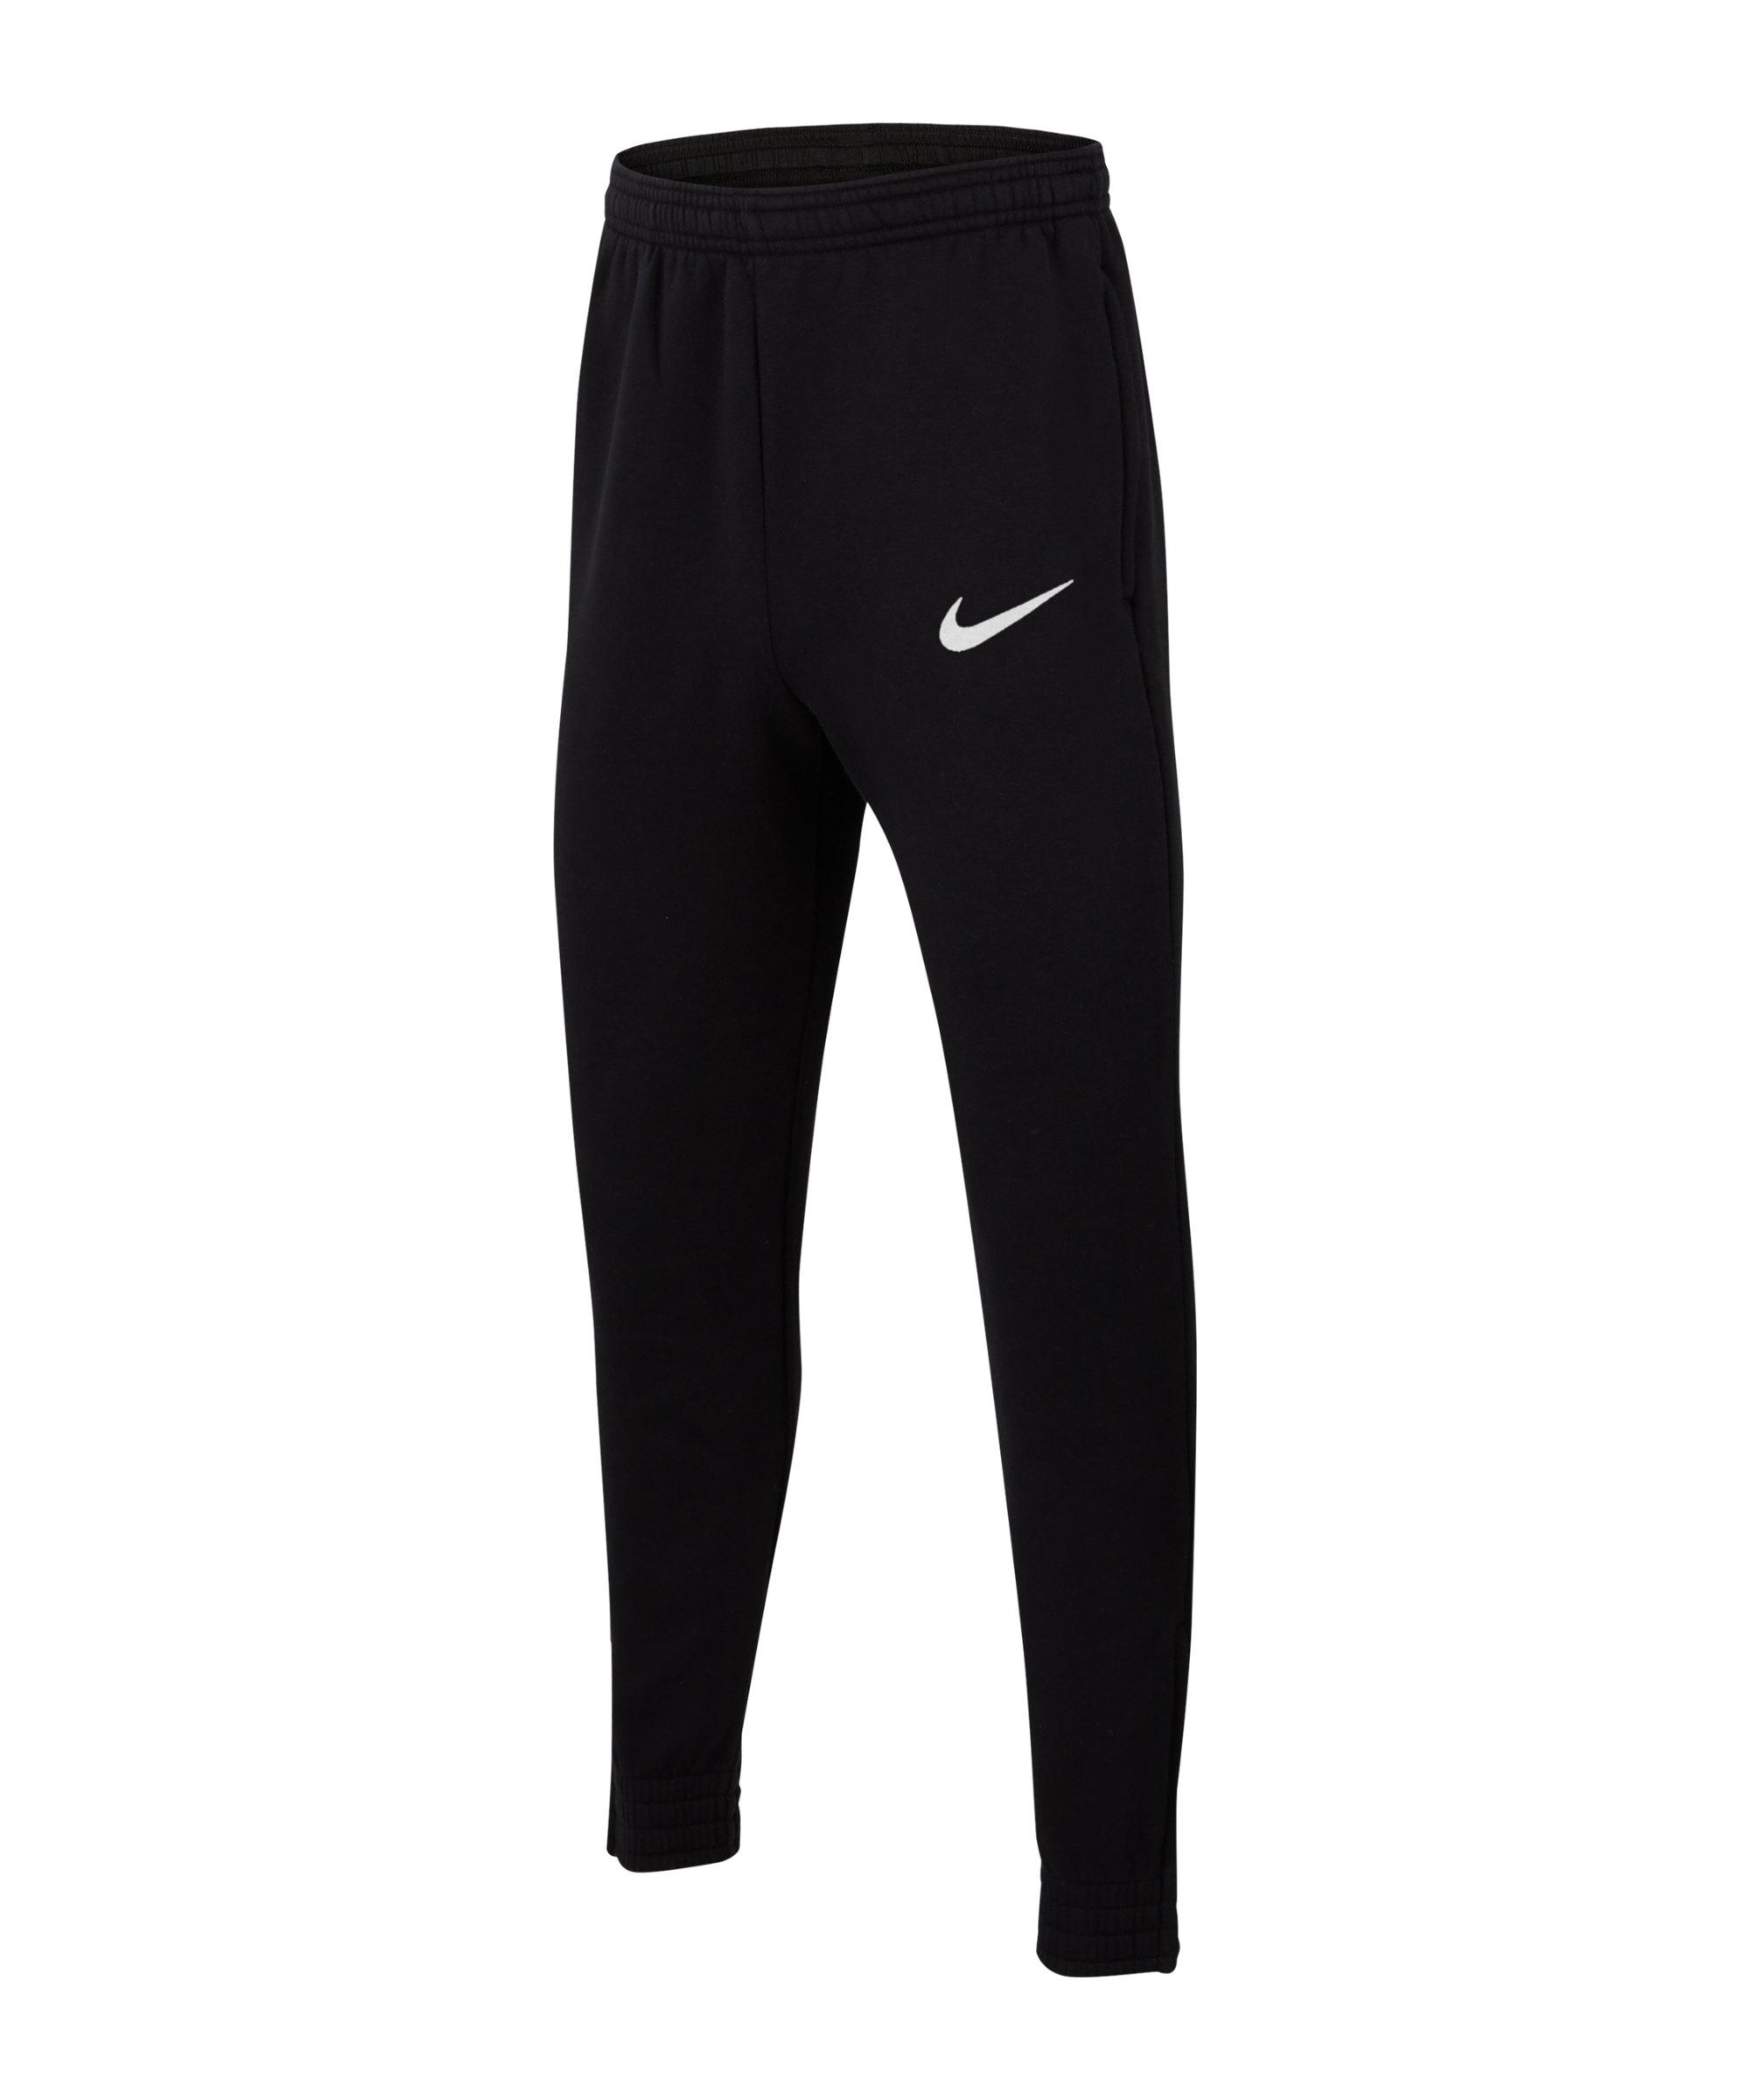 Nike Park 20 Fleece Jogginghose Kids Schwarz F010 - schwarz